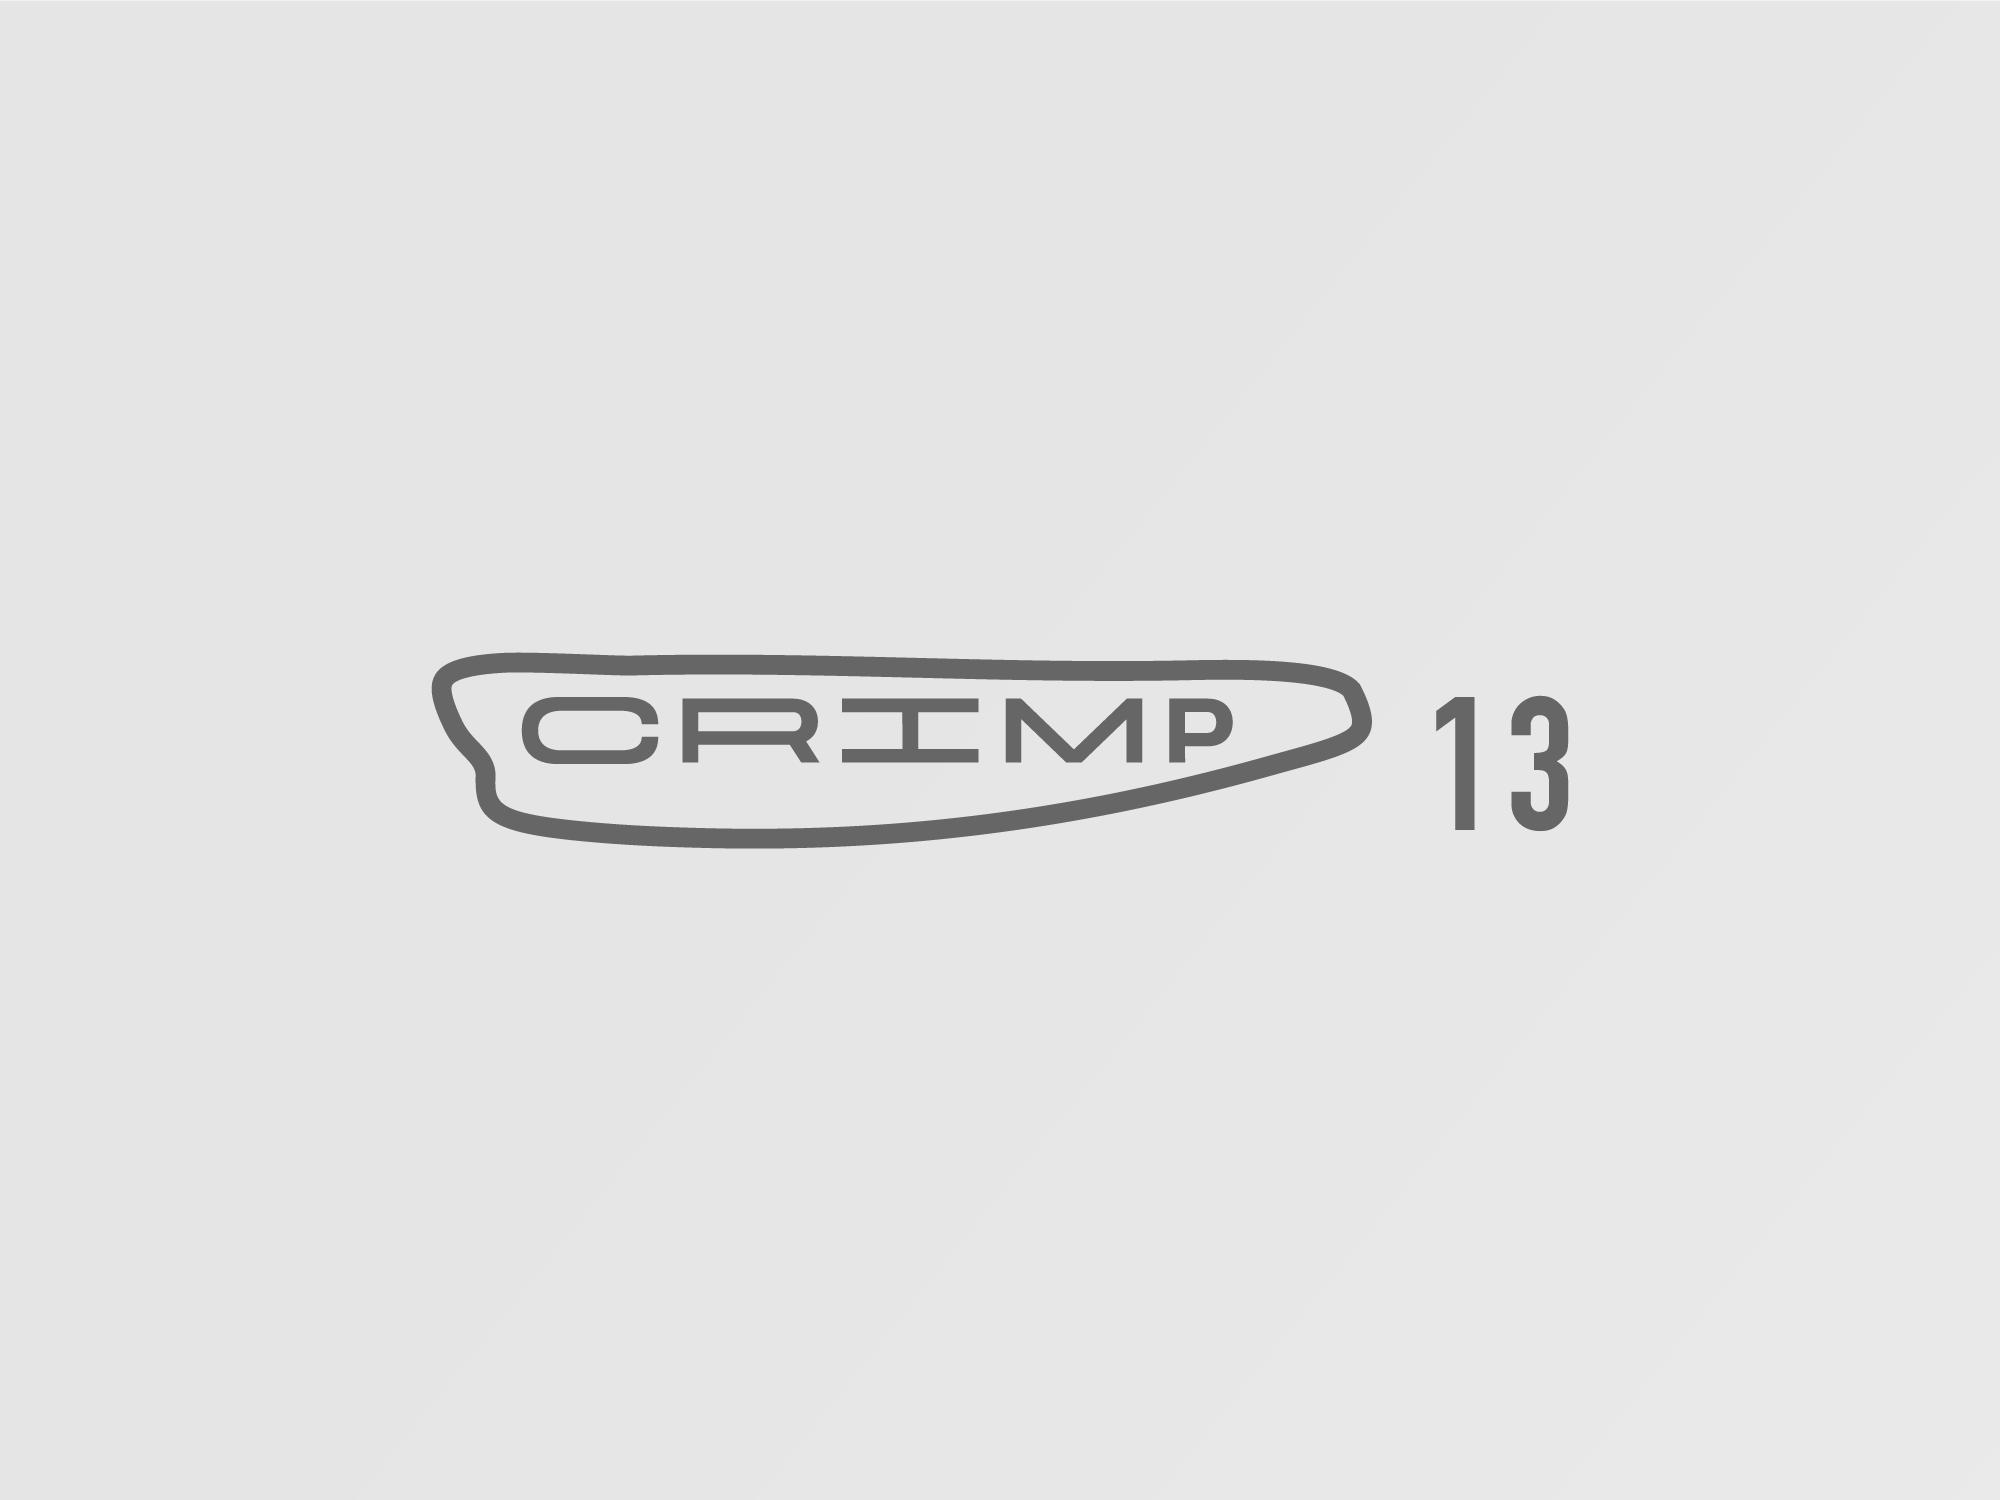 crimp 13 logo